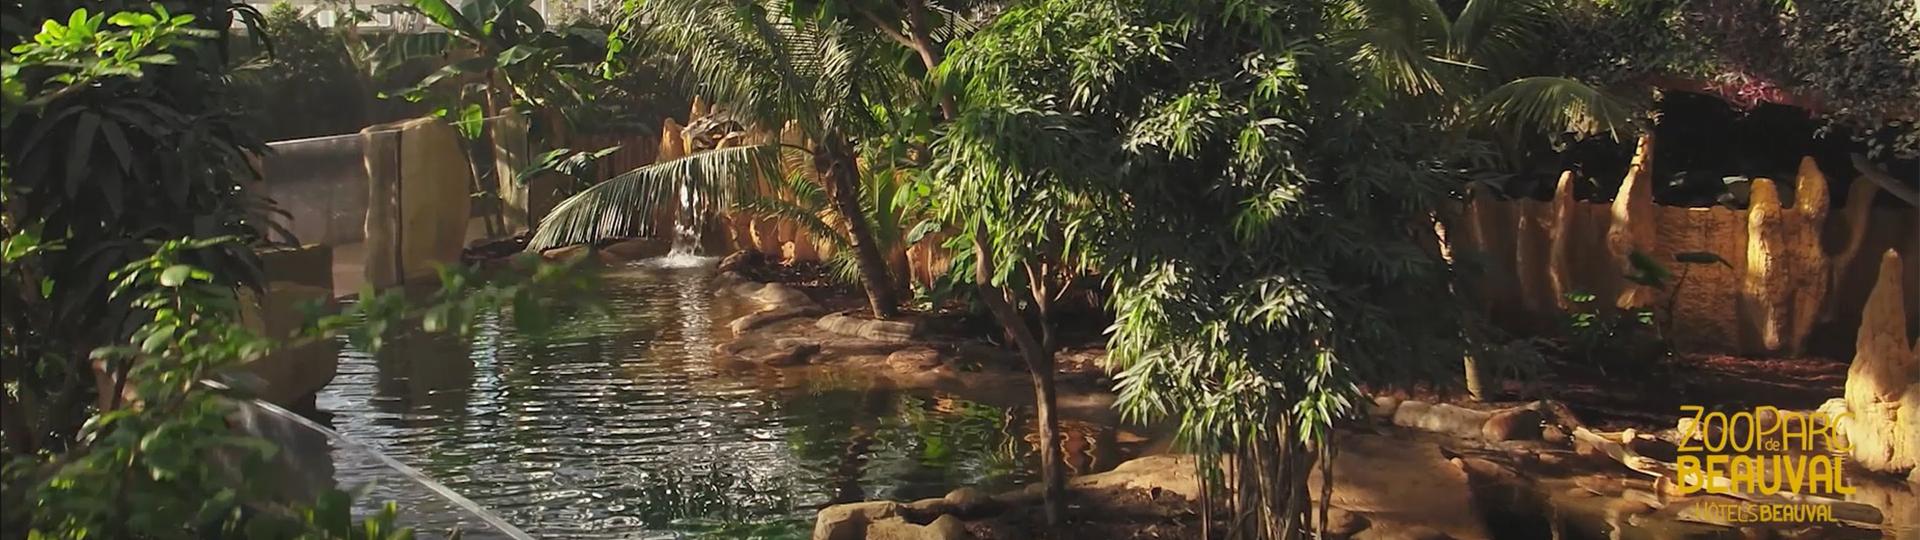 vegetation-dome